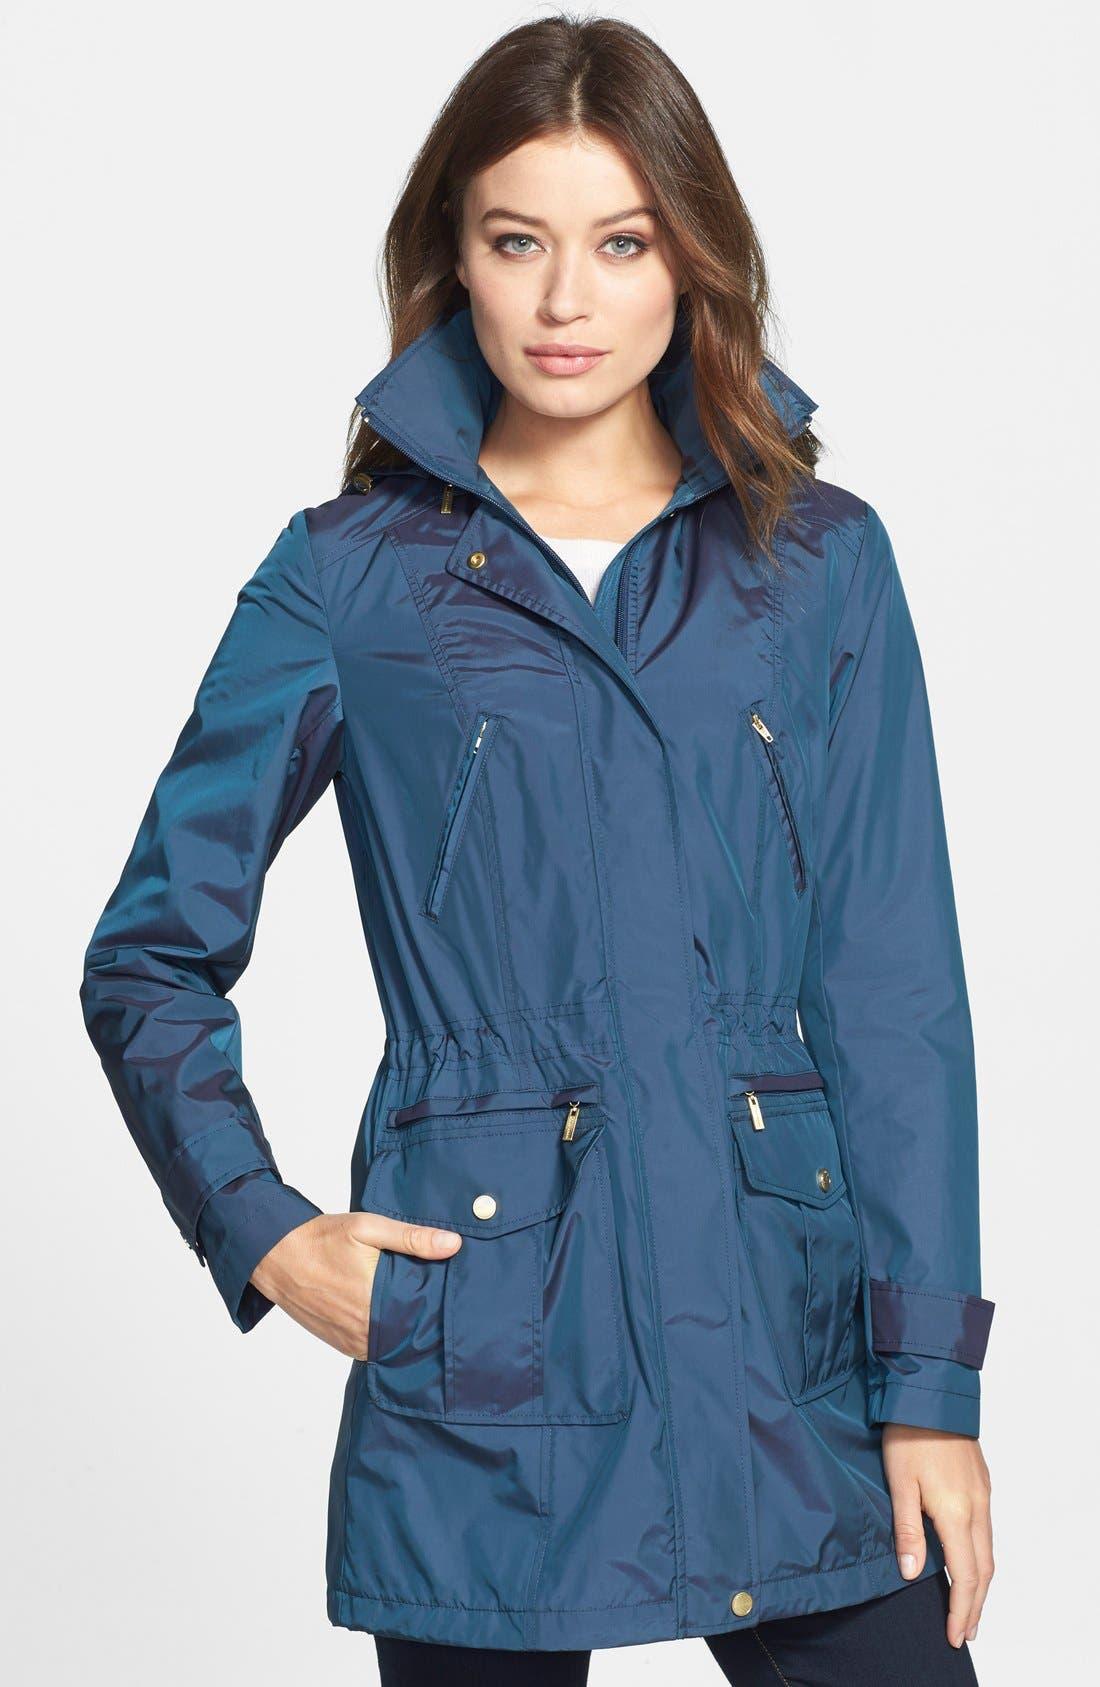 Main Image - Cole Haan Packable Raincoat with Detachable Hood